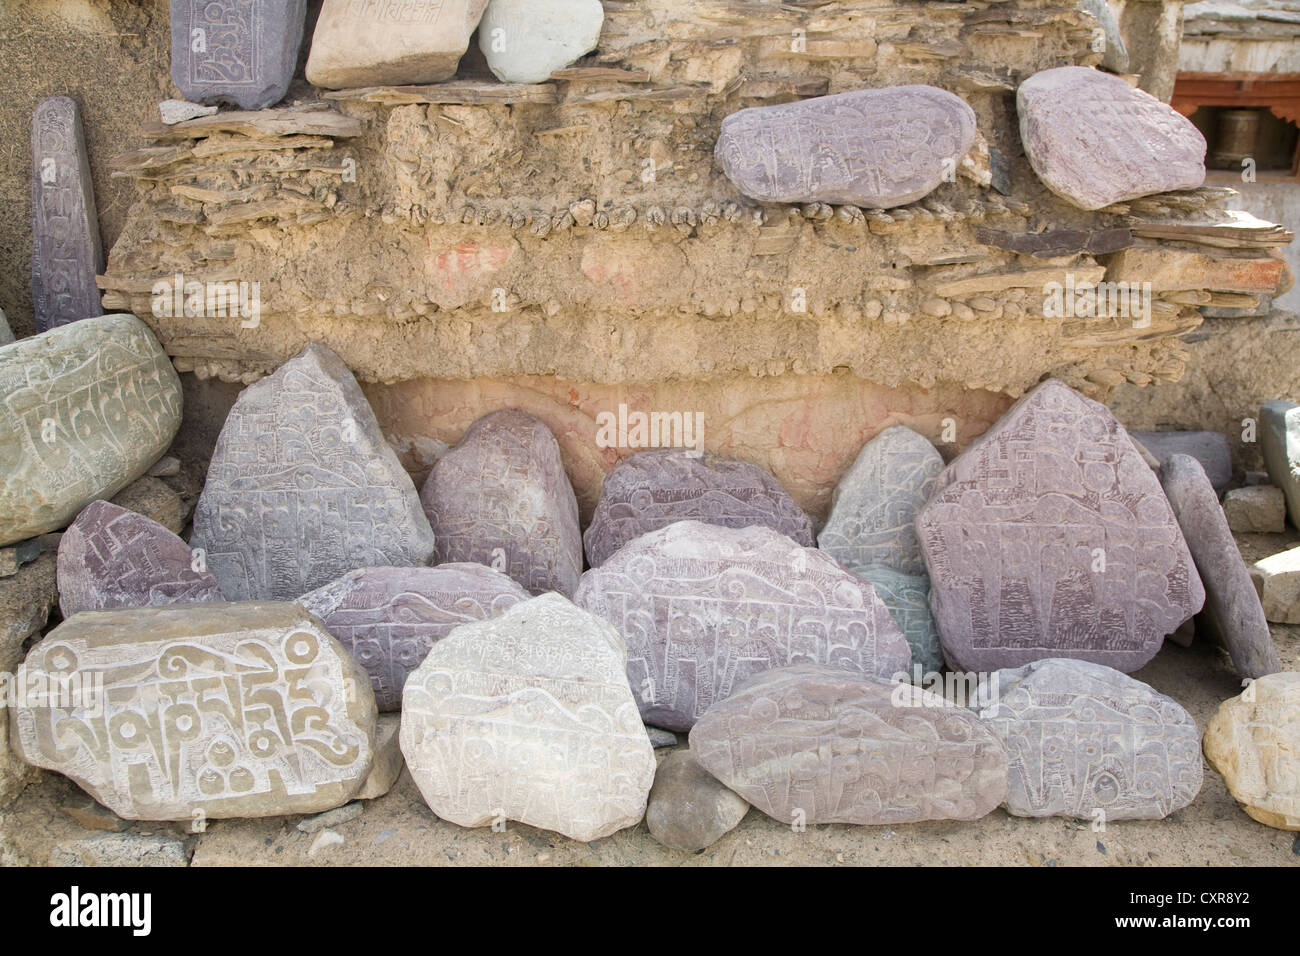 Mani prayer stones in the Indian Himalaya. - Stock Image